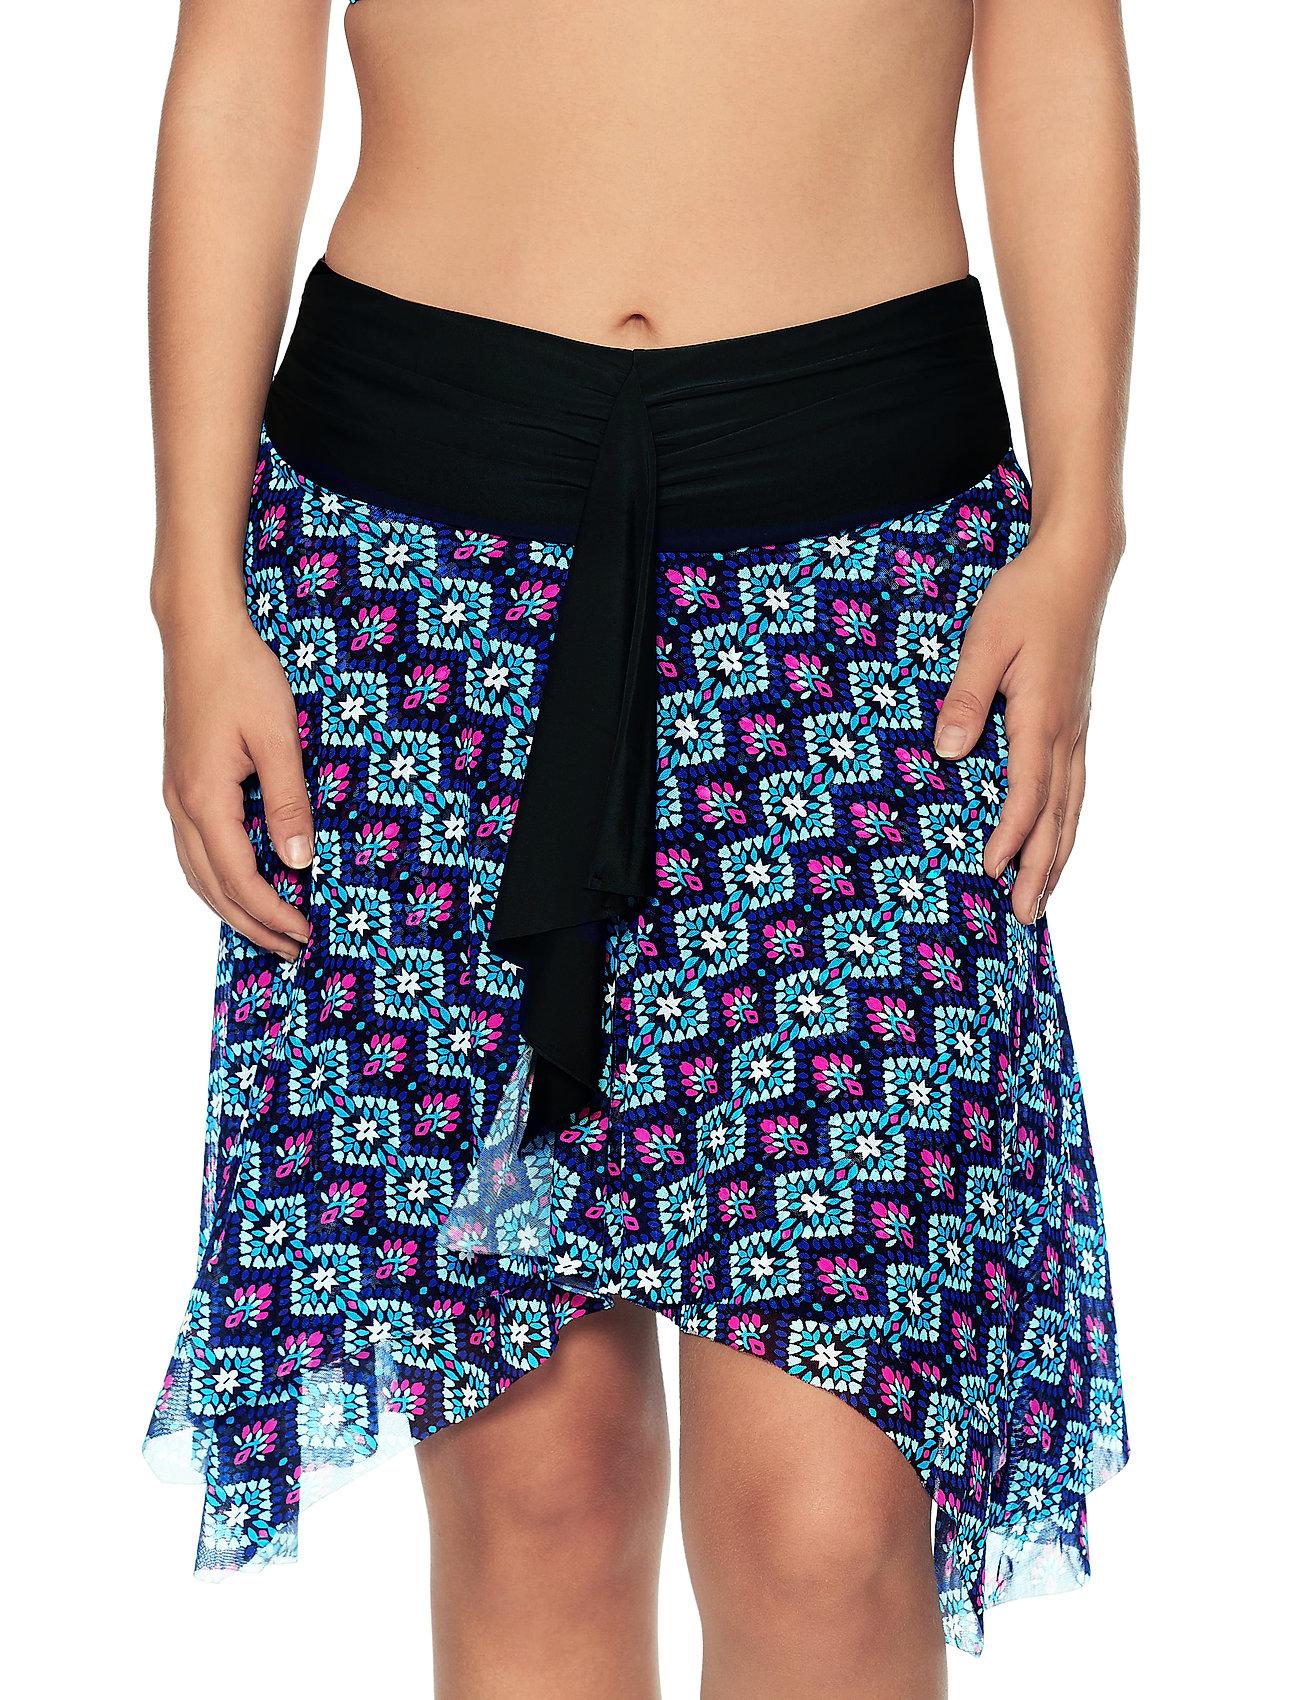 Wiki Swim Beach Skirt/dress (2-in-1) - Badkläder Sevilla